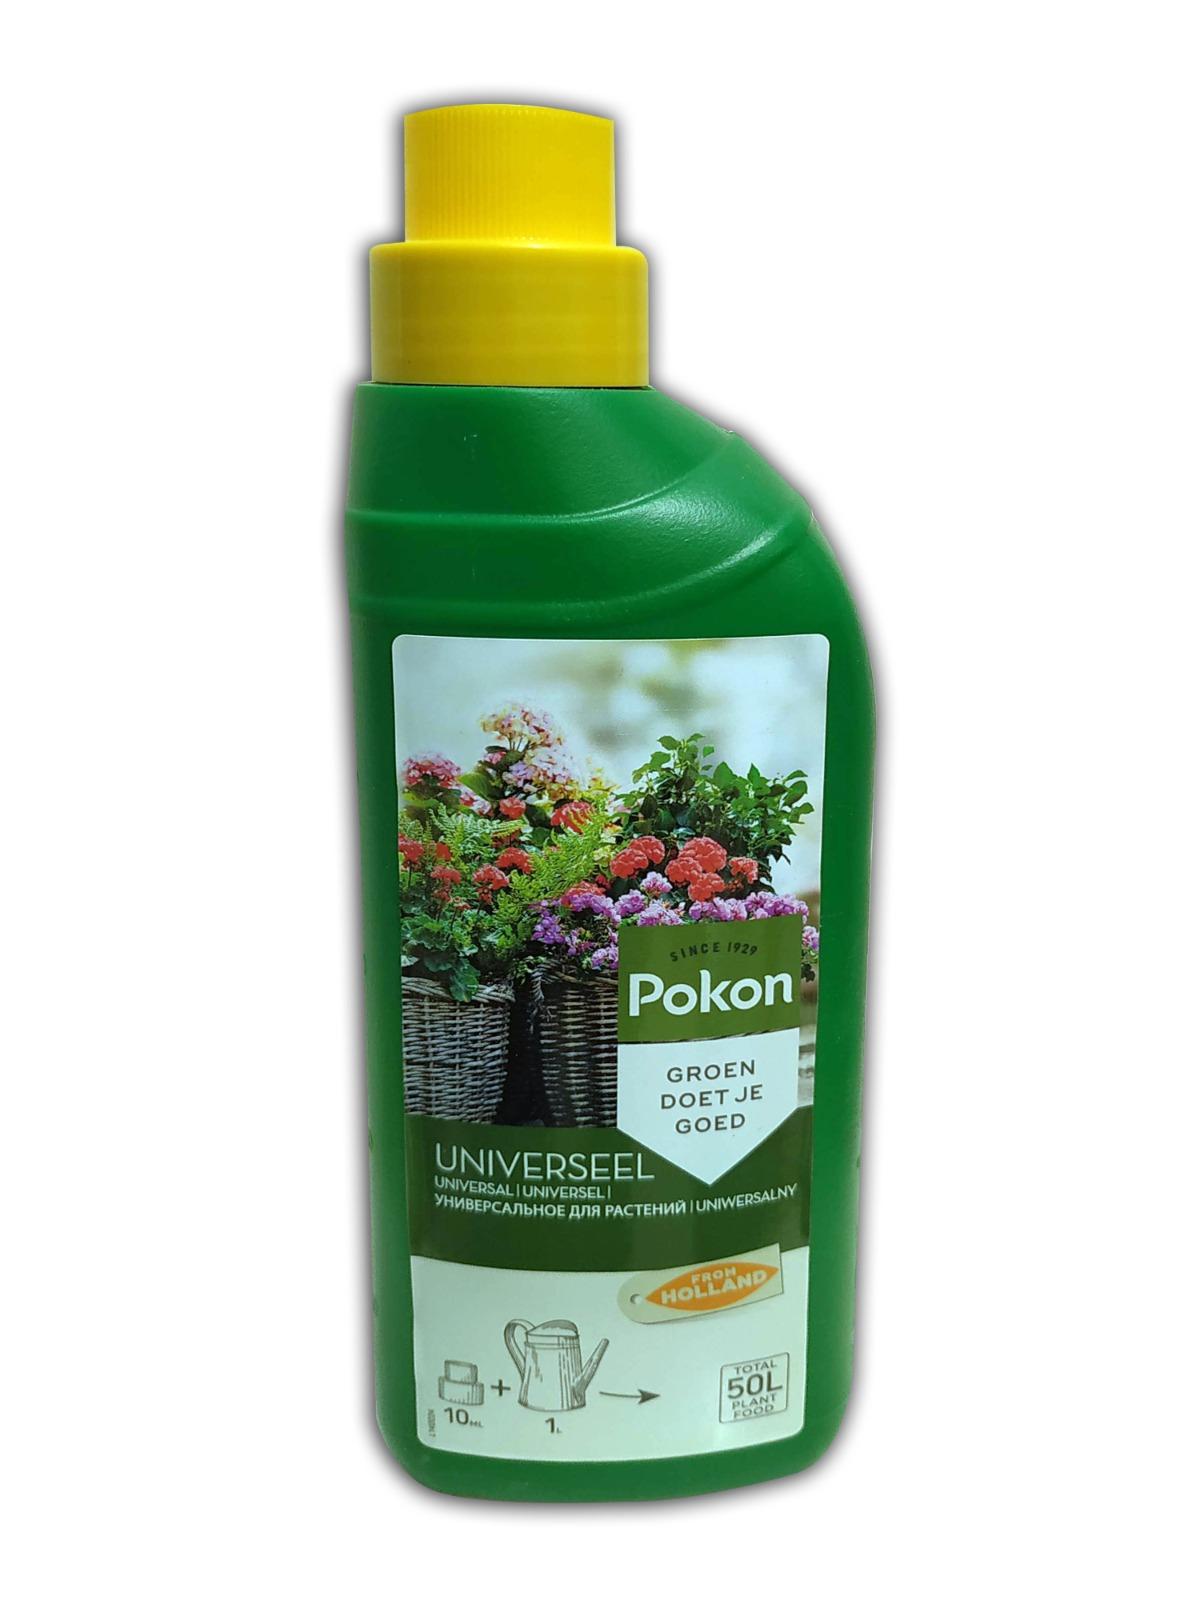 Pokon Universal for indoor Soil Fertilizer Pesticide